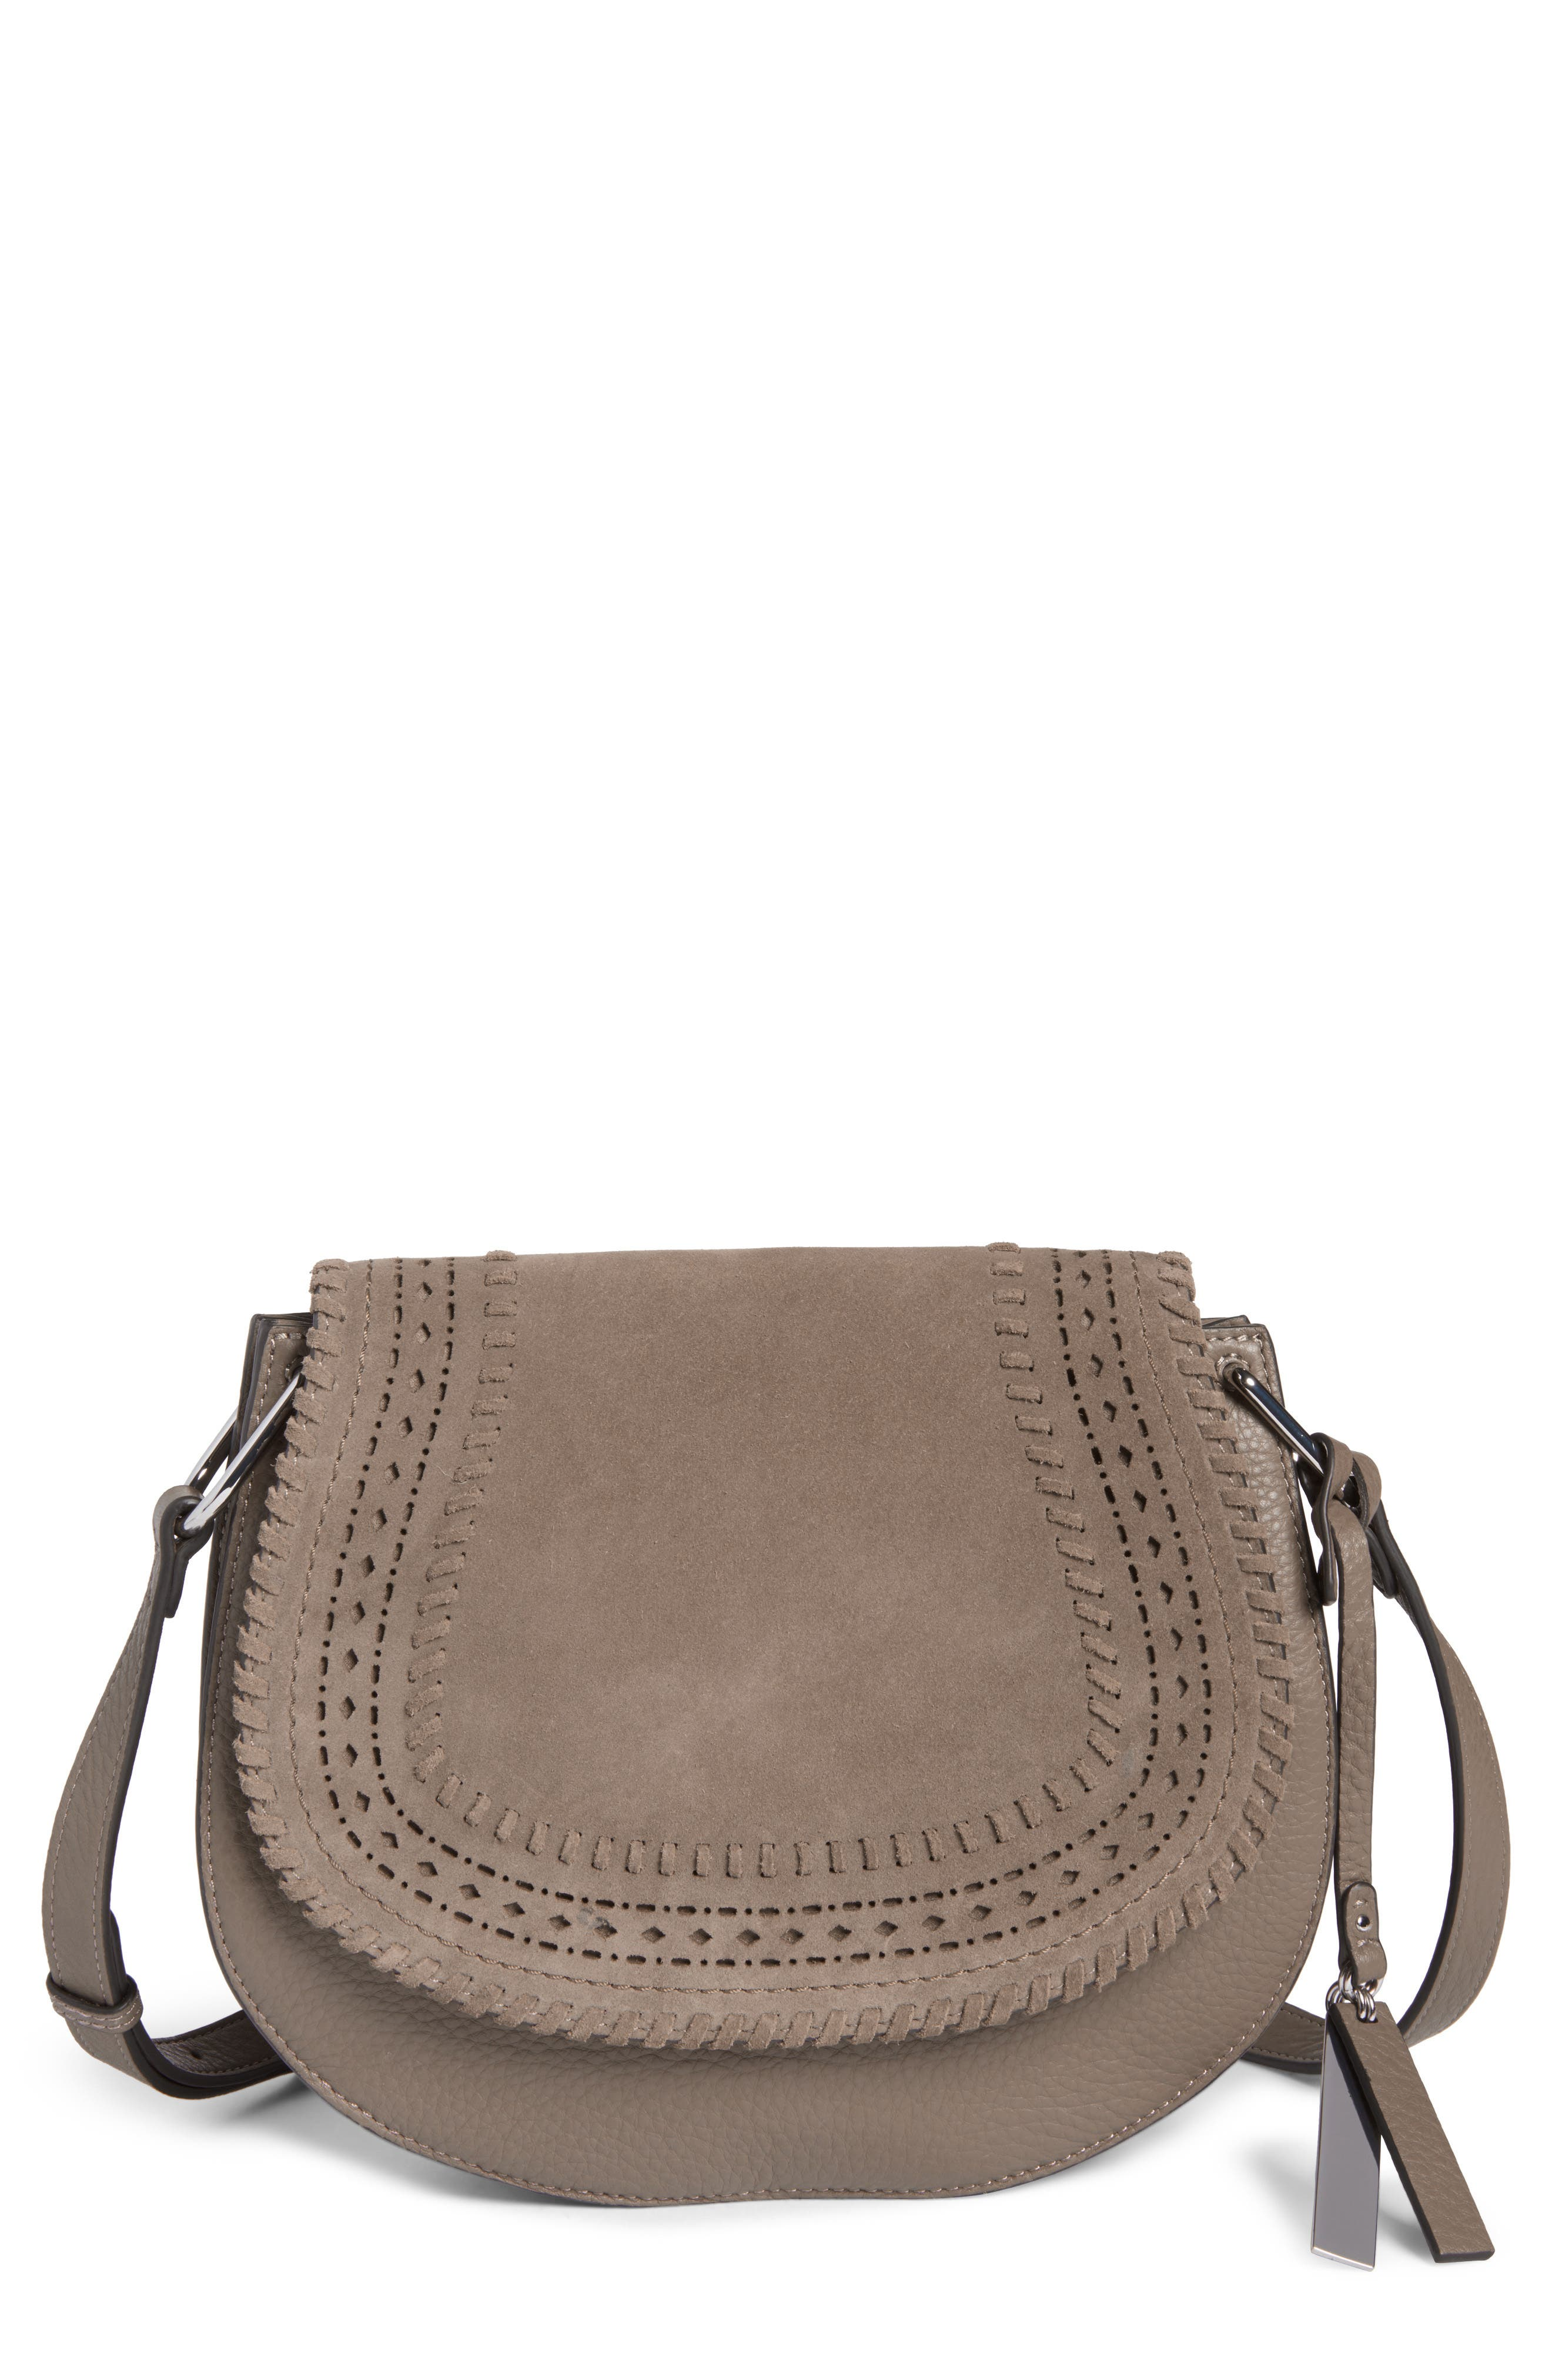 Kirie Suede & Leather Crossbody Saddle Bag,                         Main,                         color, 020